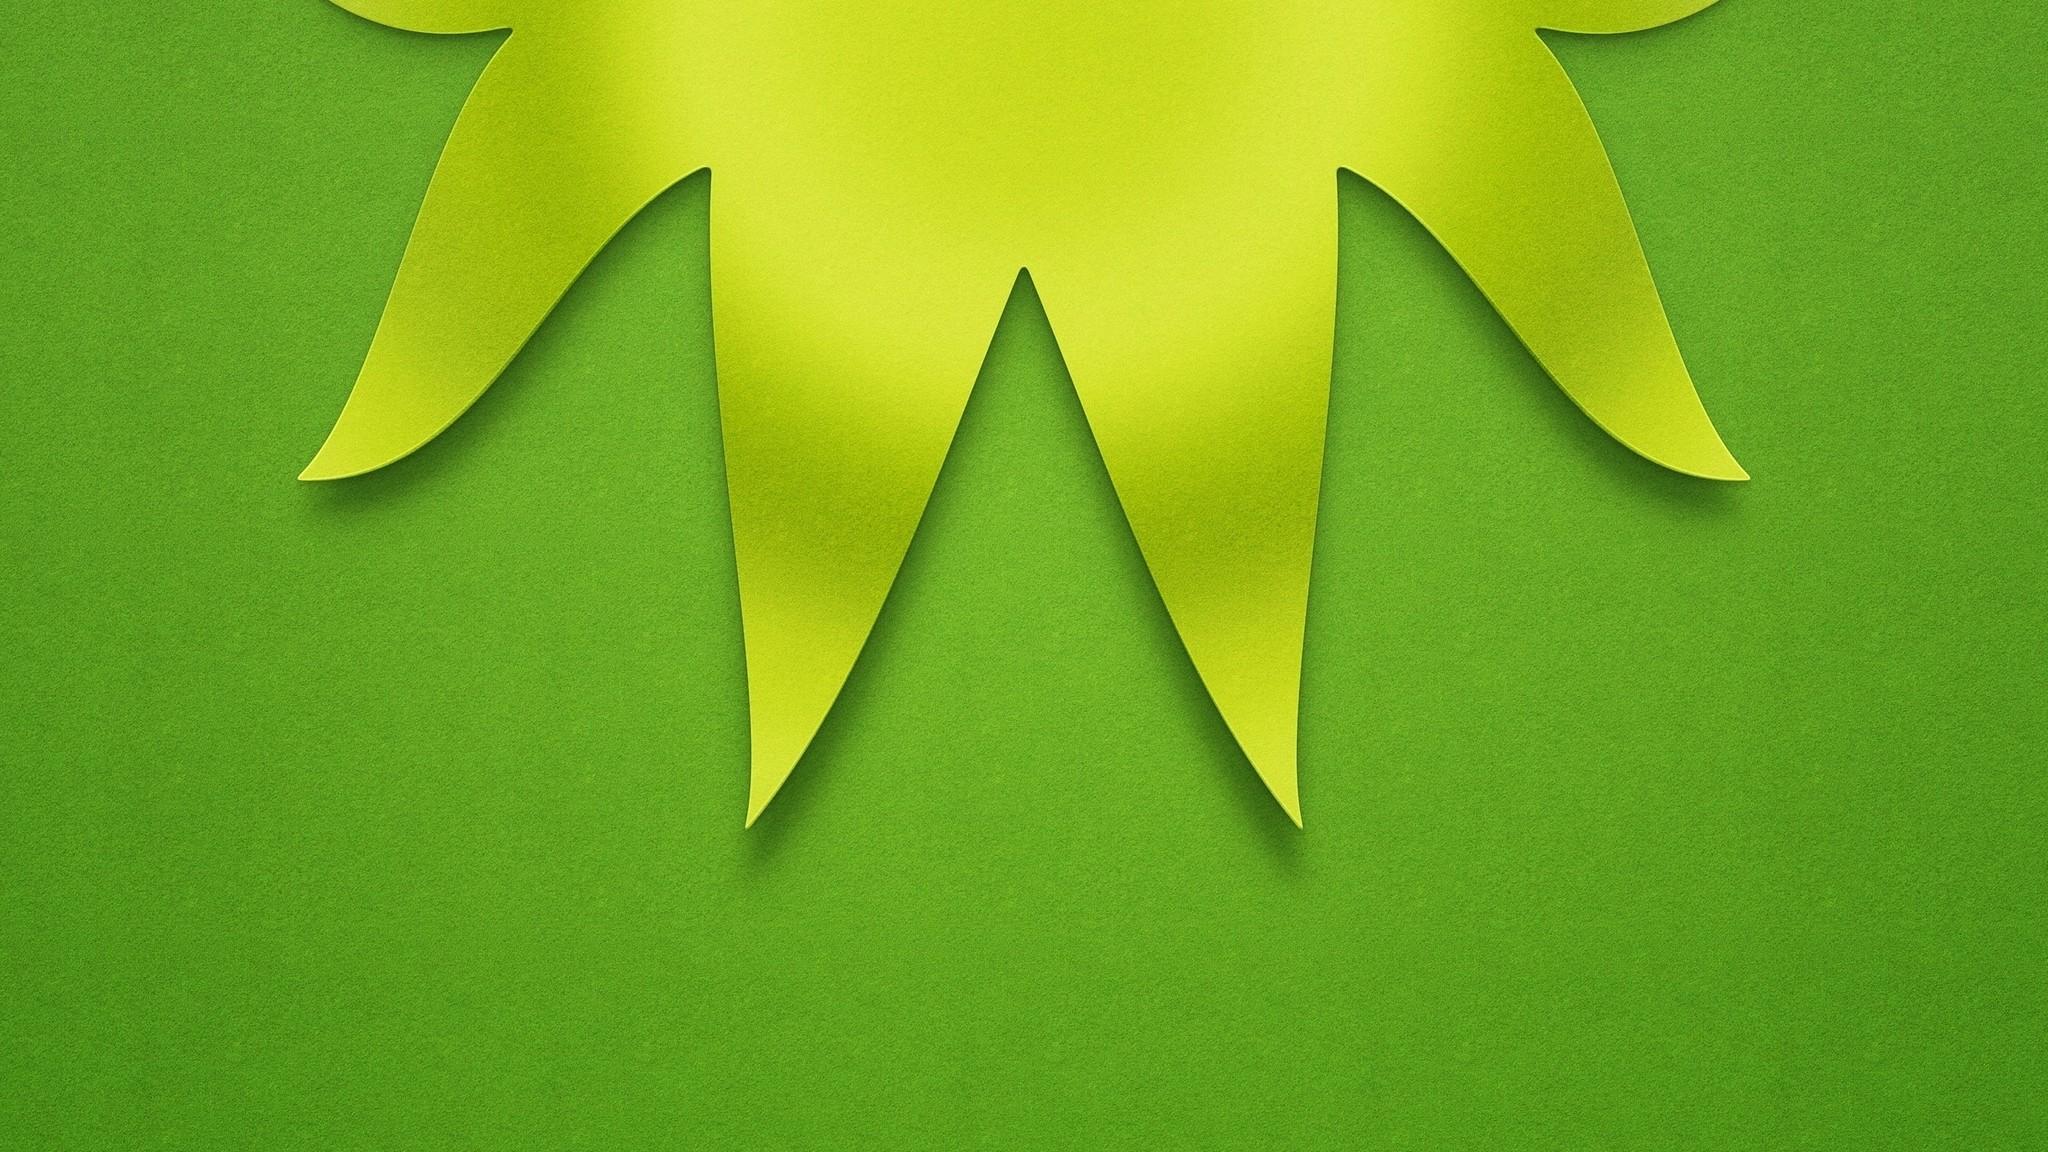 Description: Download Muppet kermit the frog wallpaper/desktop background  in HD & Widescreen resolution.